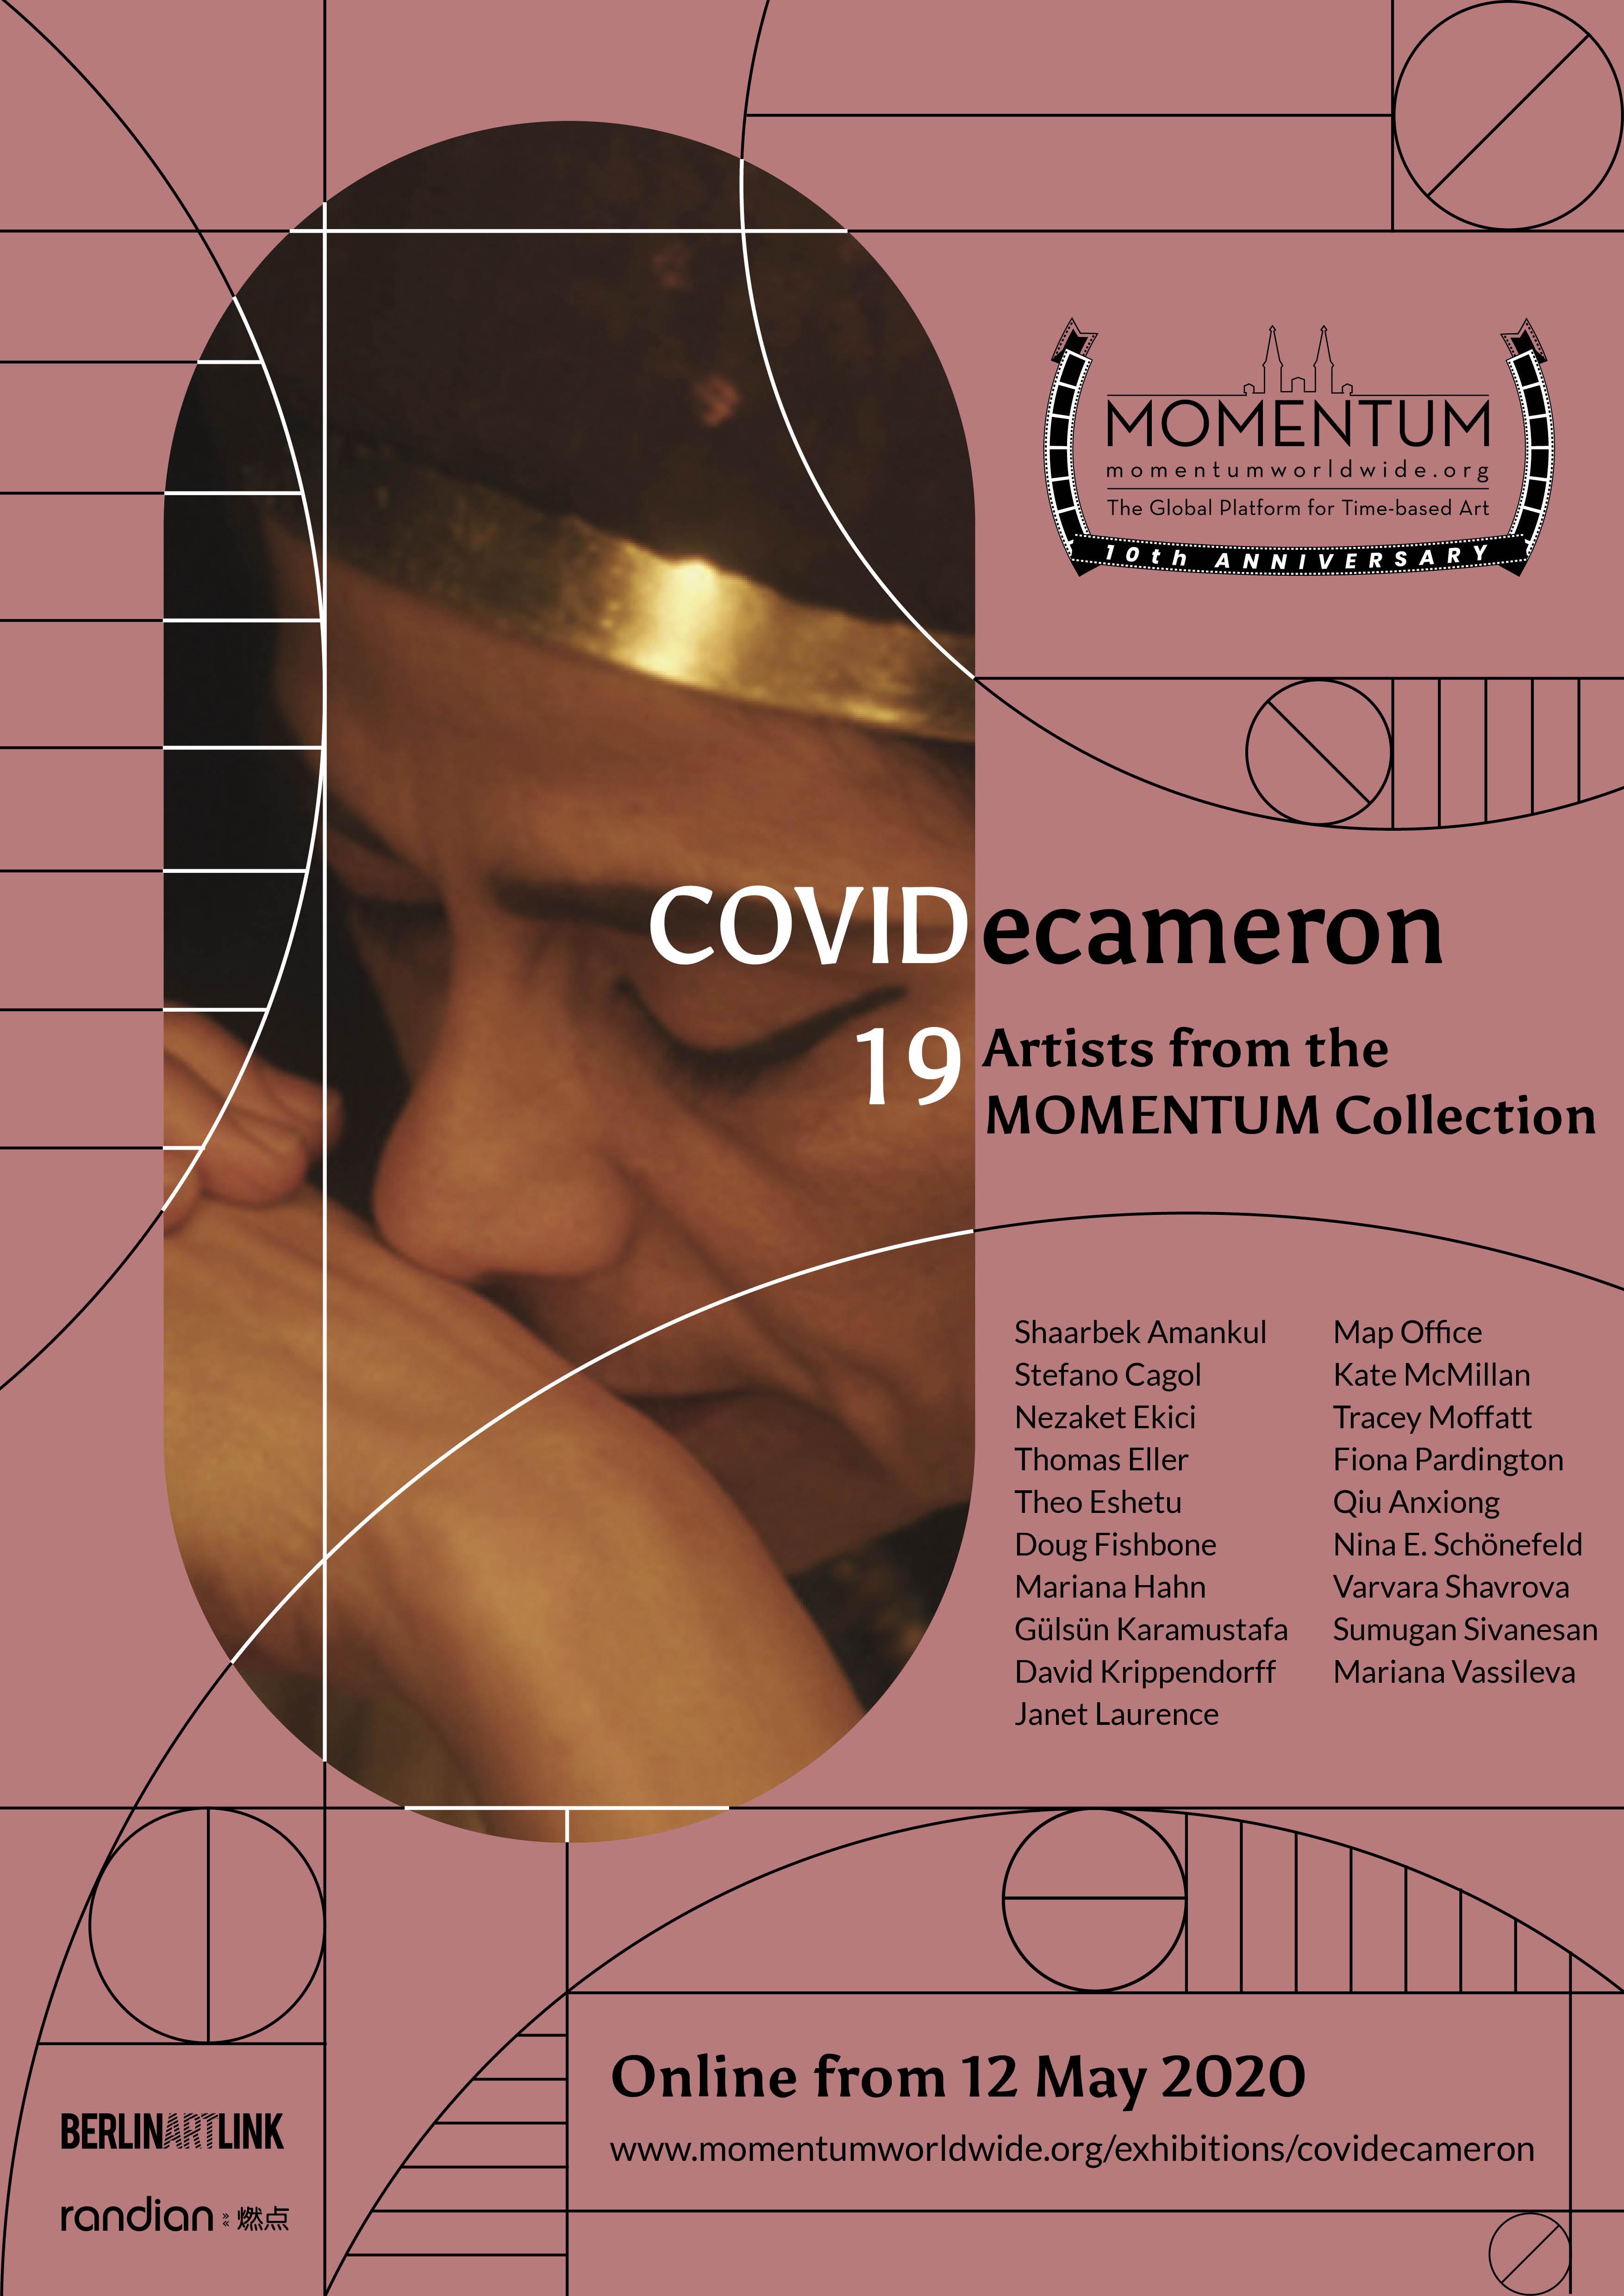 COVIDecameron_Poster9_Krippendorff